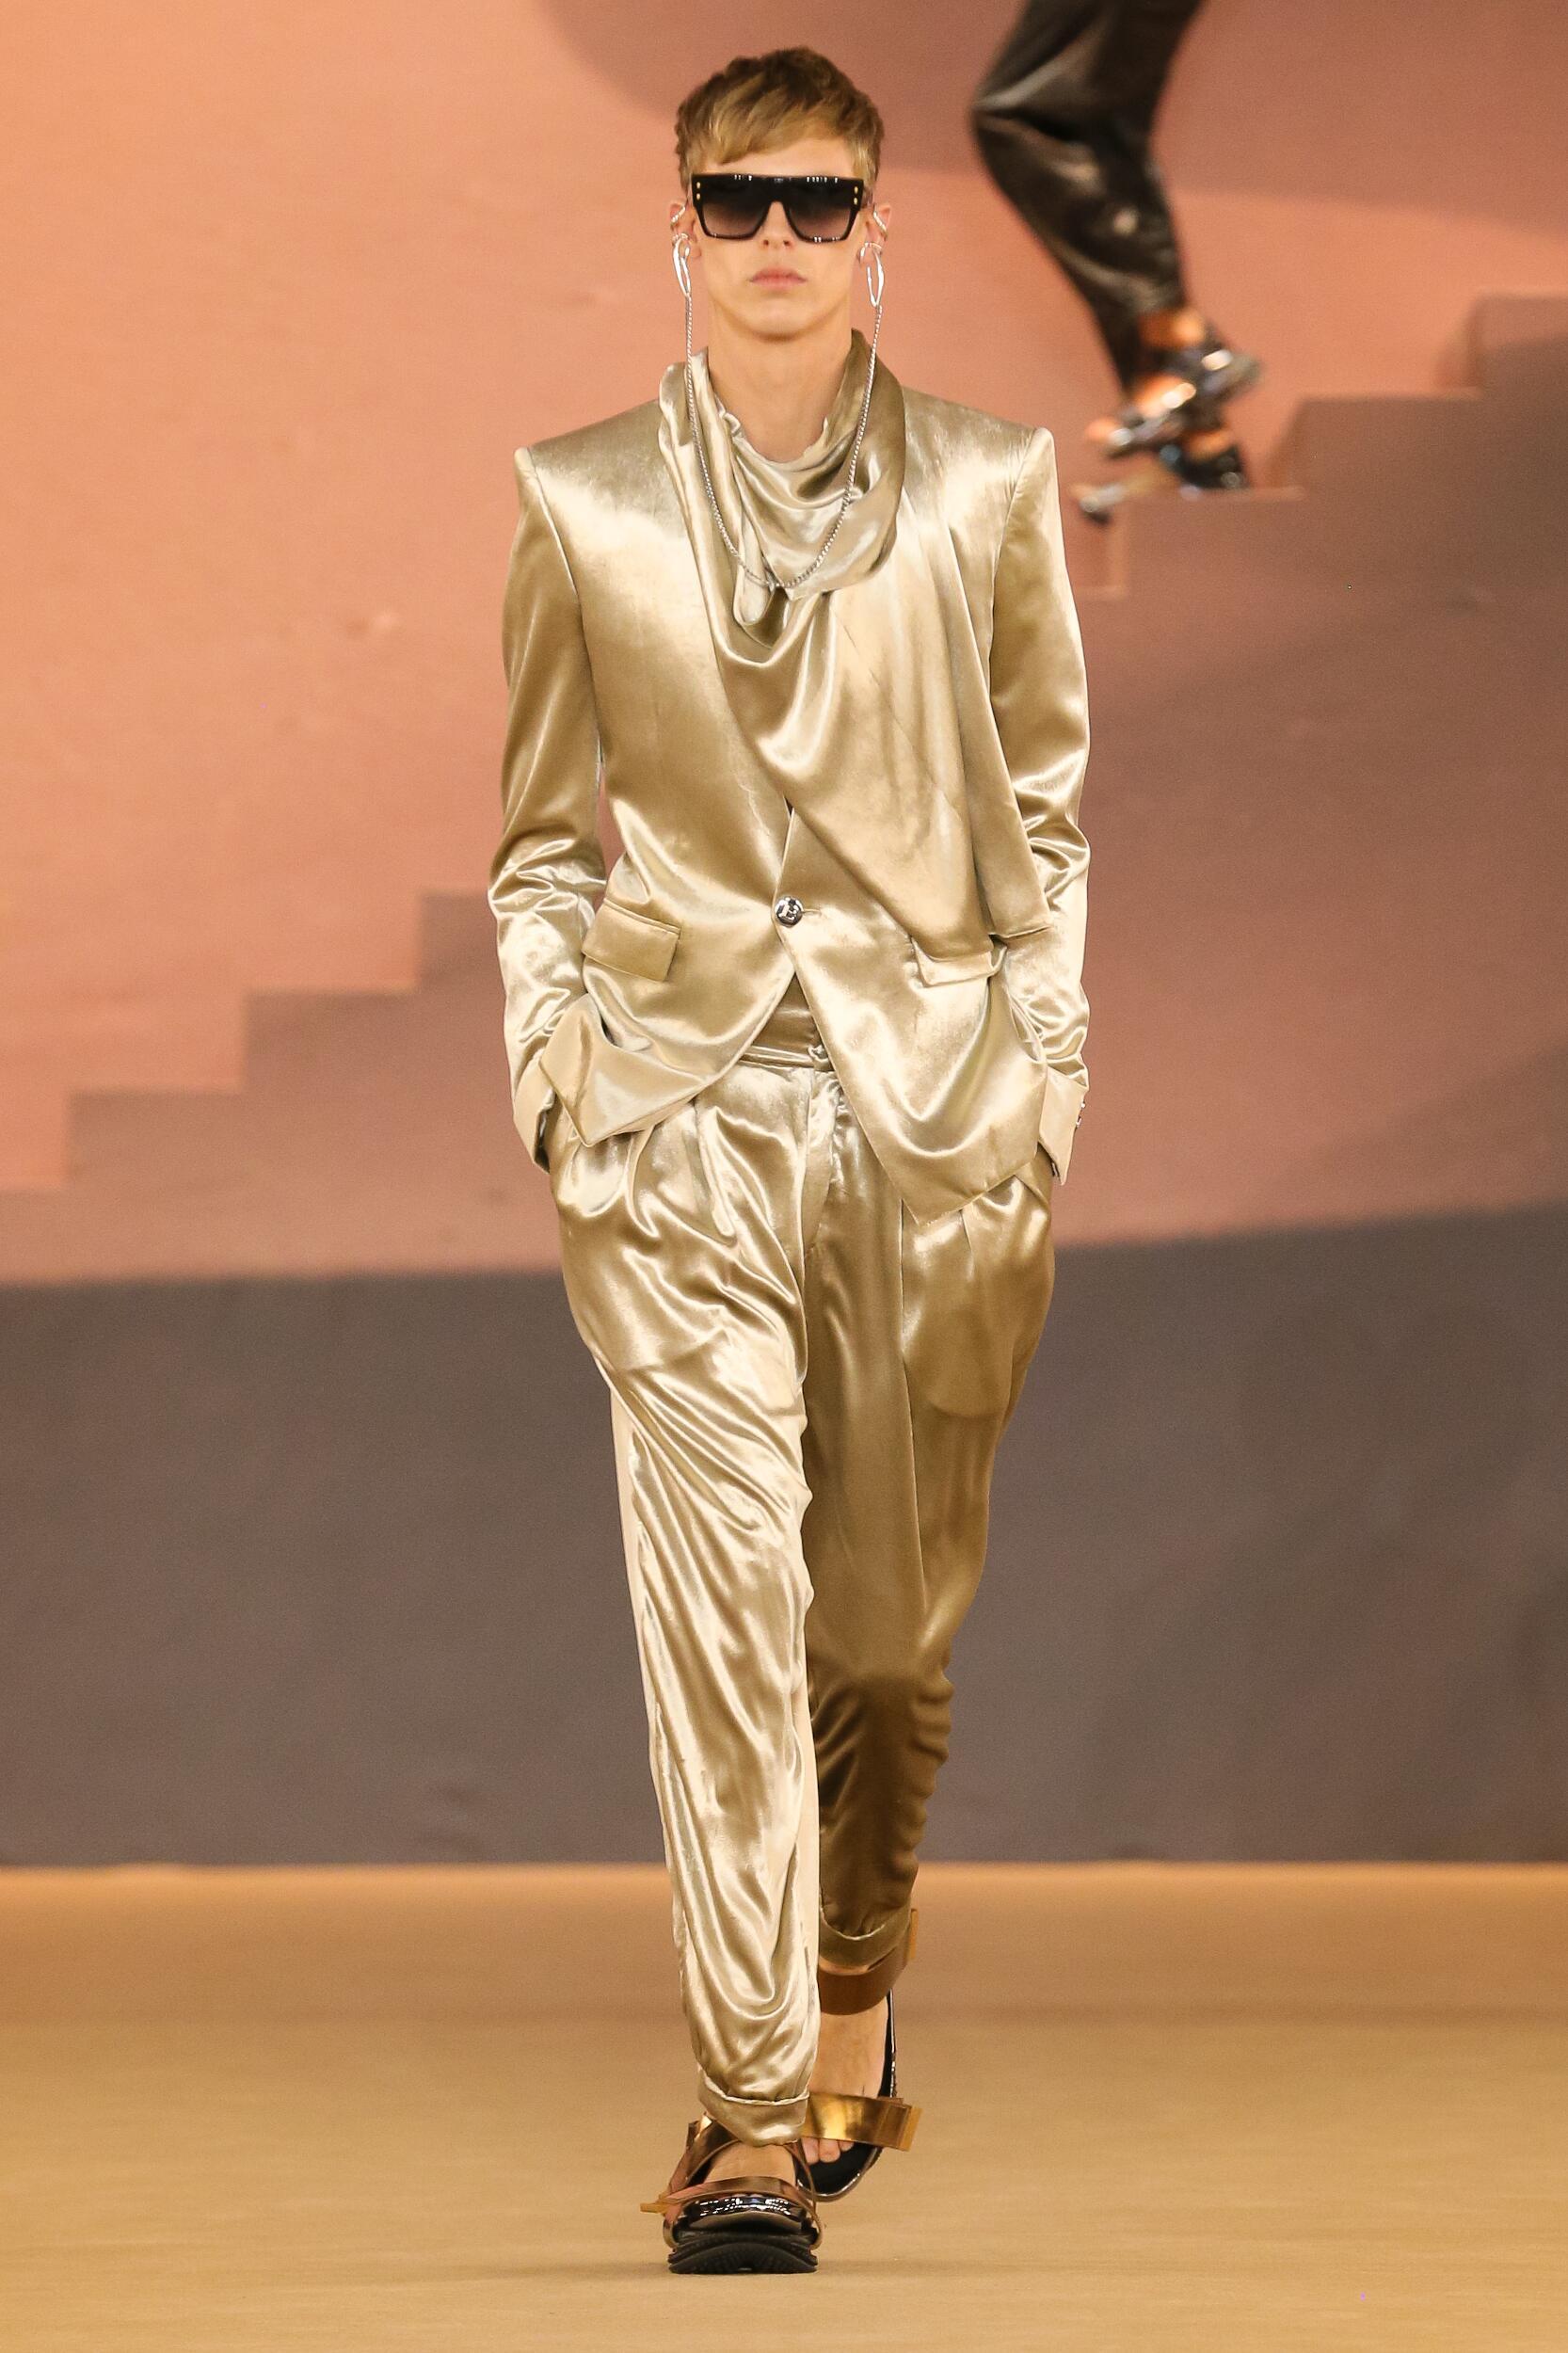 FW 2020 Balmain Show Paris Fashion Week Menswear